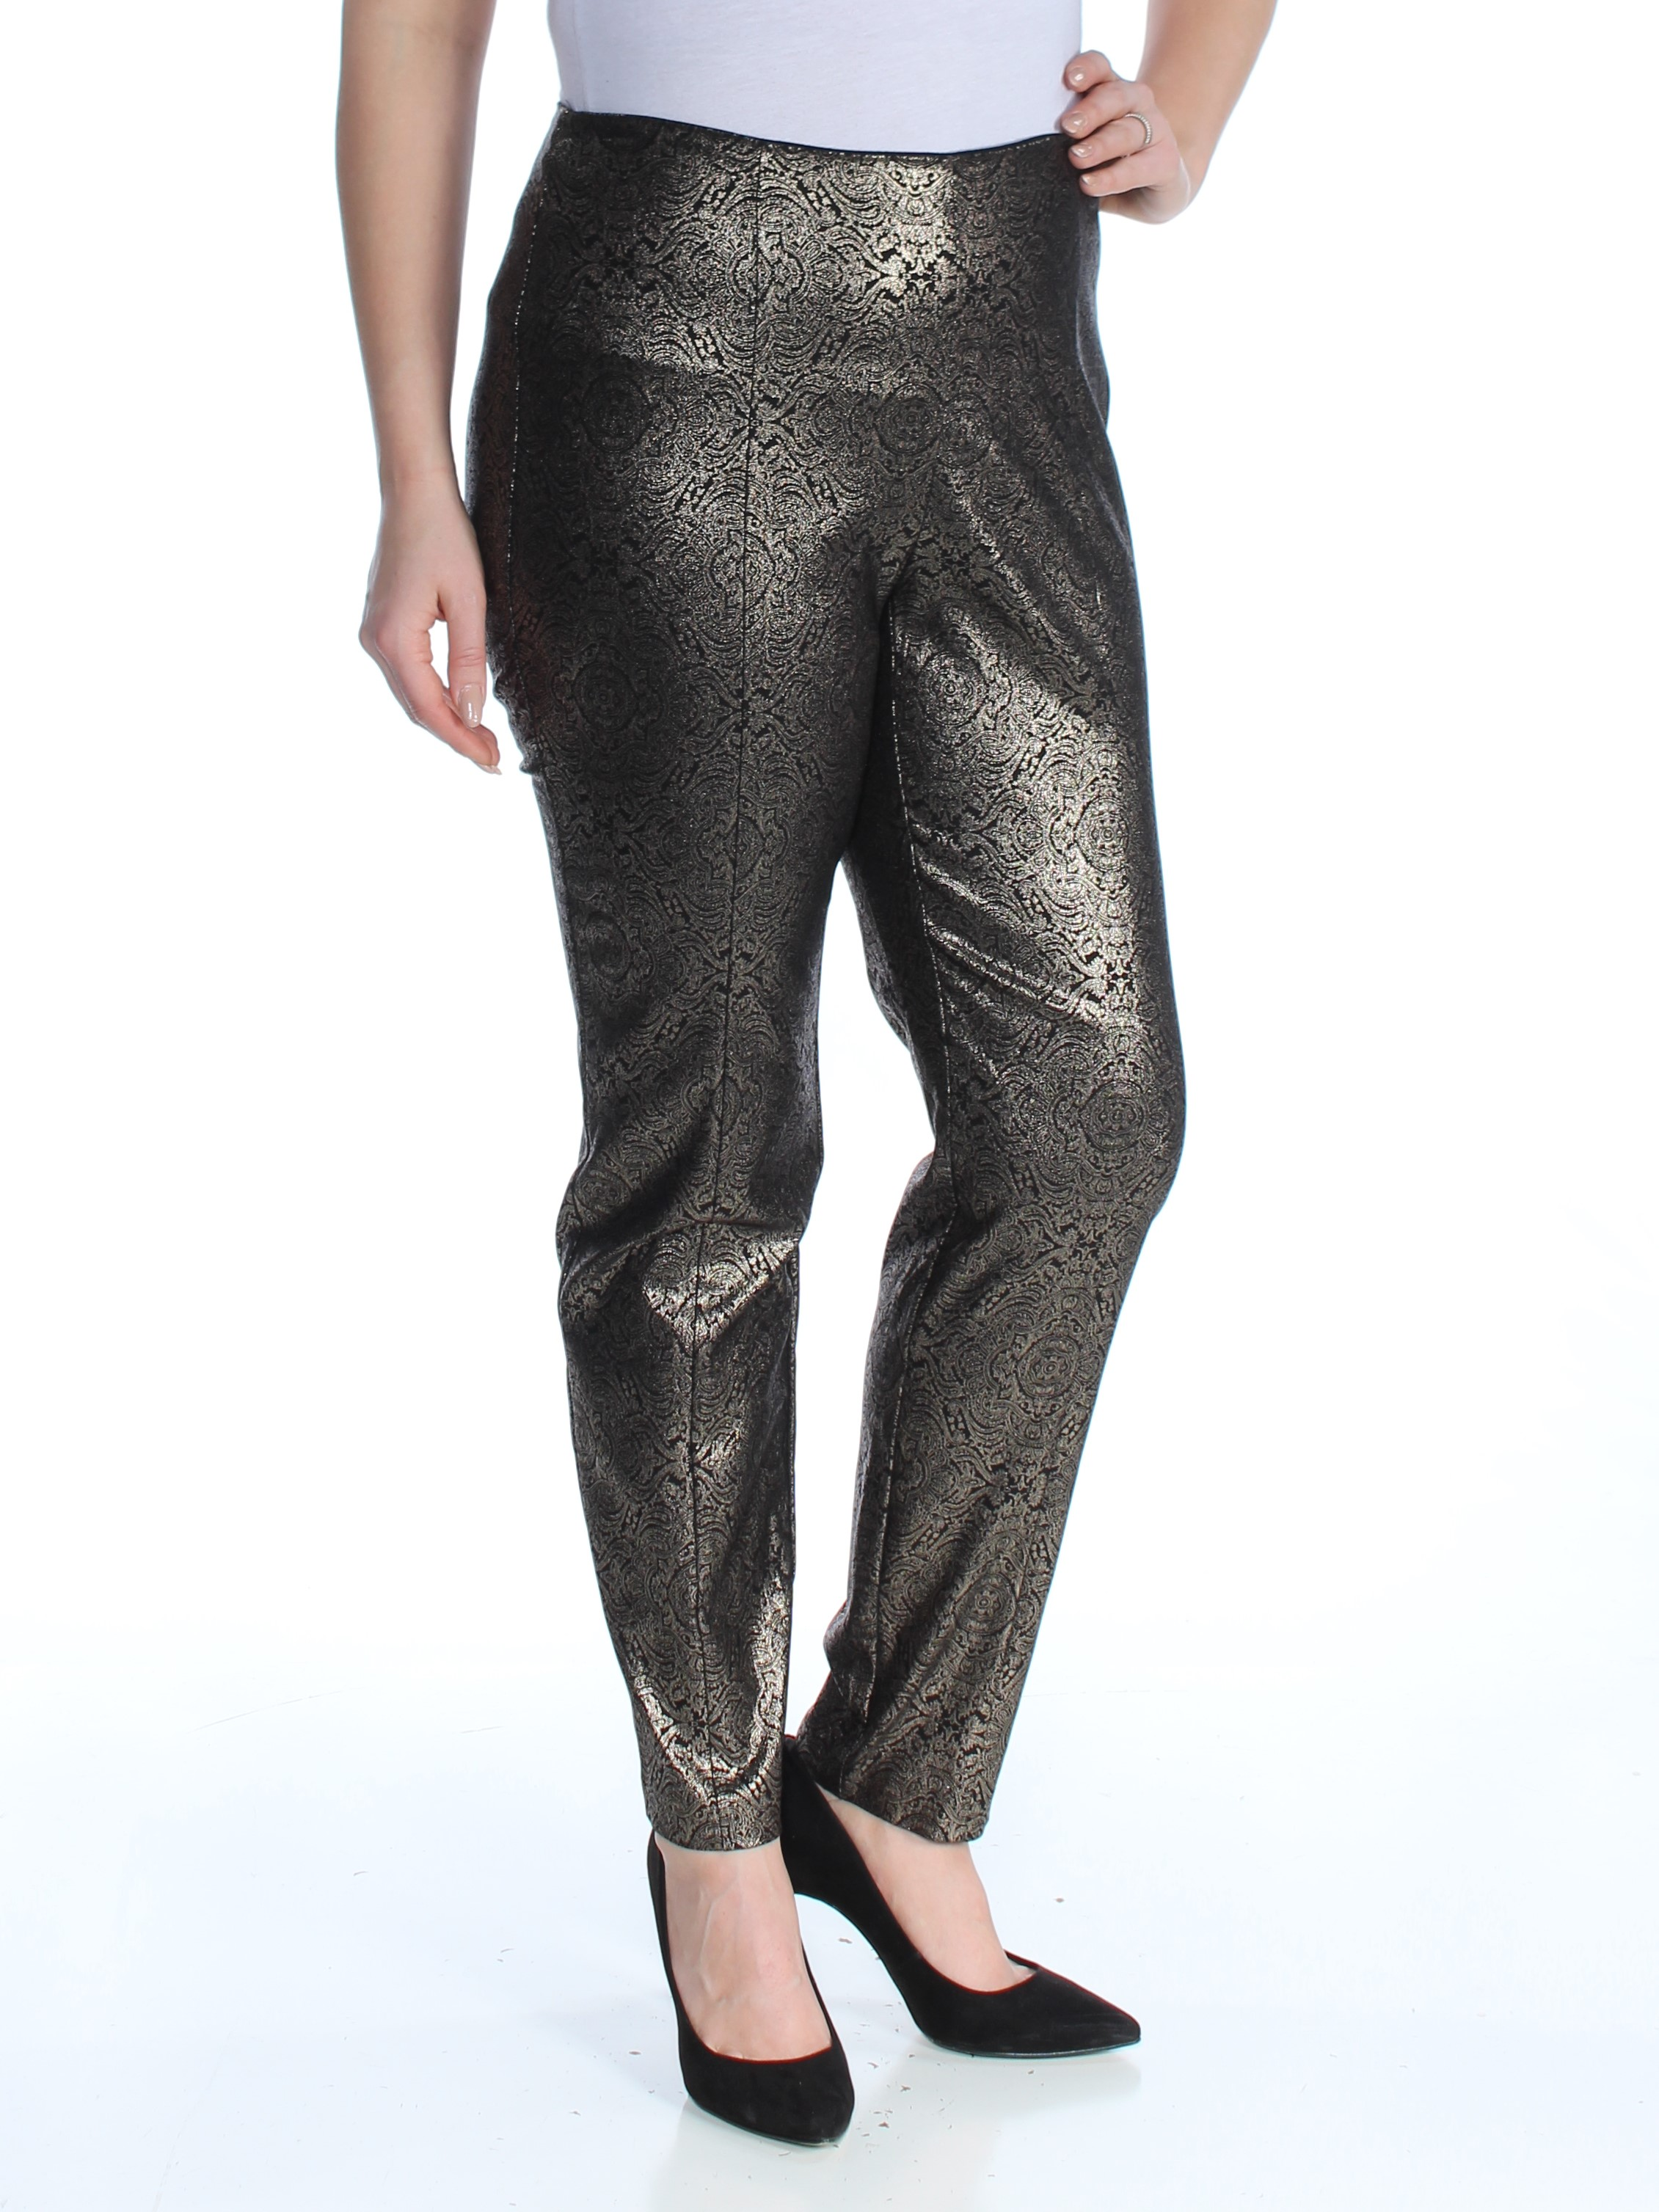 ea6f7223ddf84 ALFANI Womens Gold Metallic Skinny Cocktail Pants Plus Size  14W